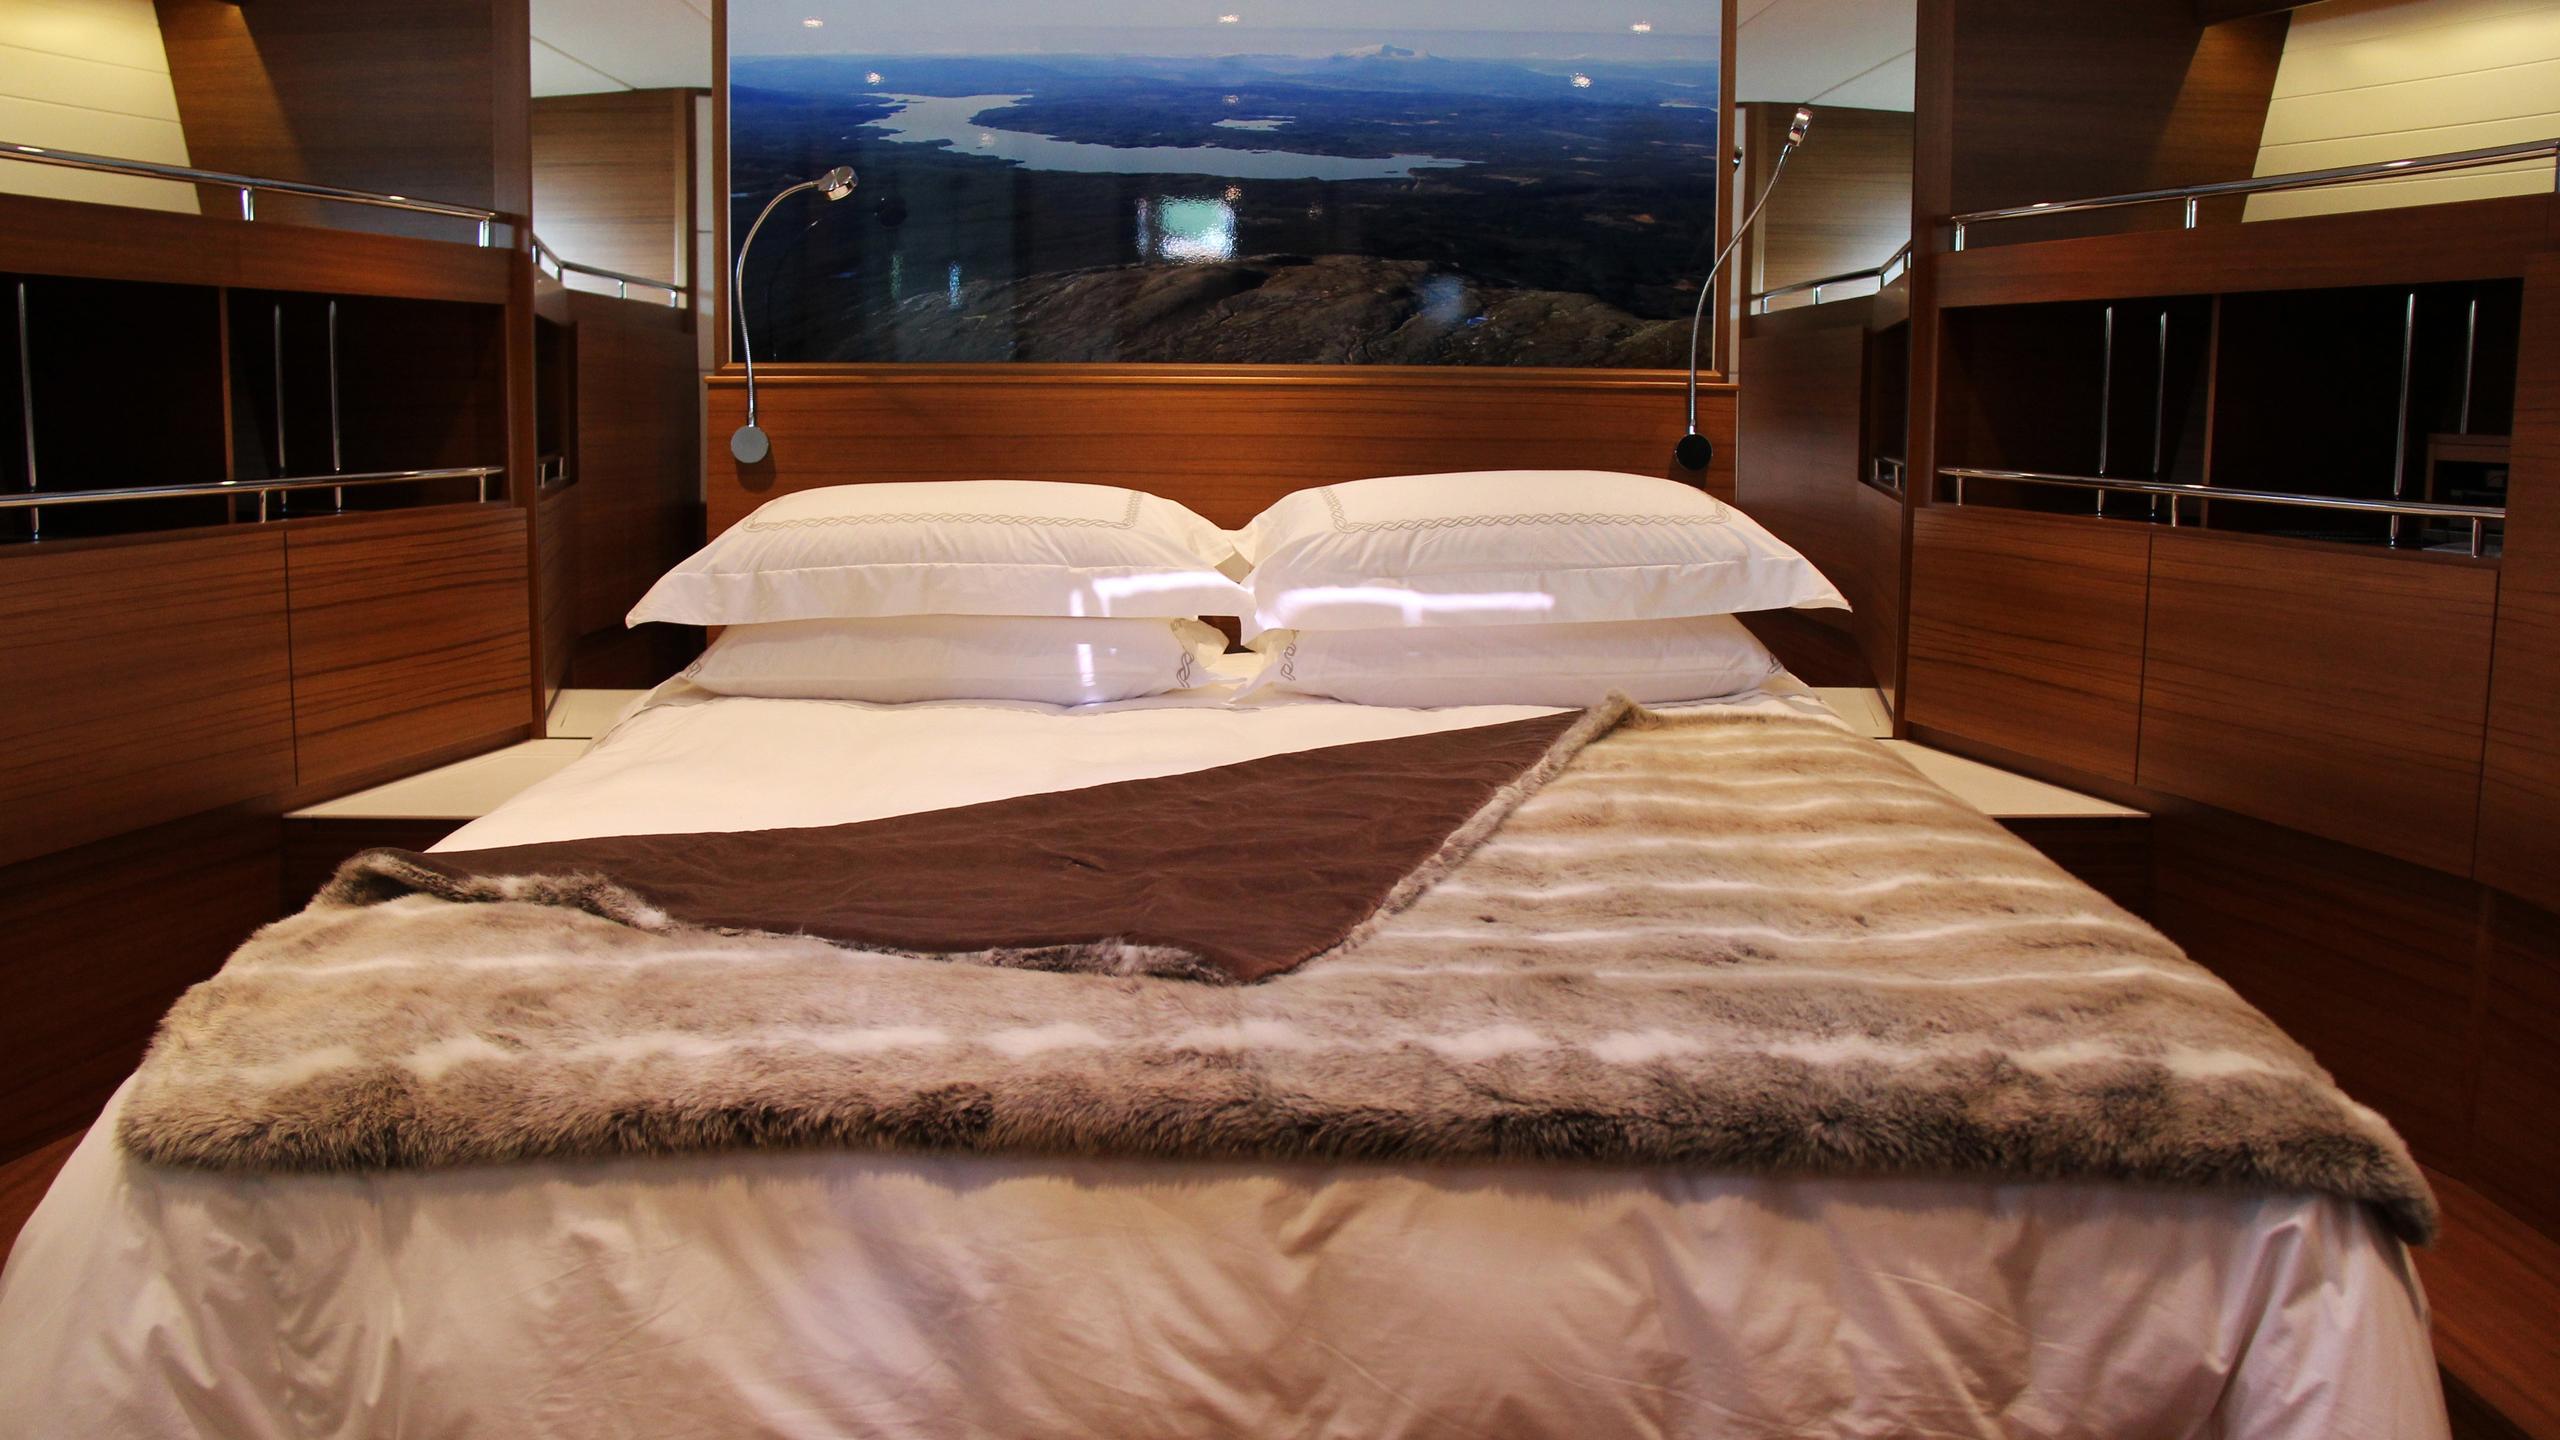 Delta carbon 88 yacht cabin